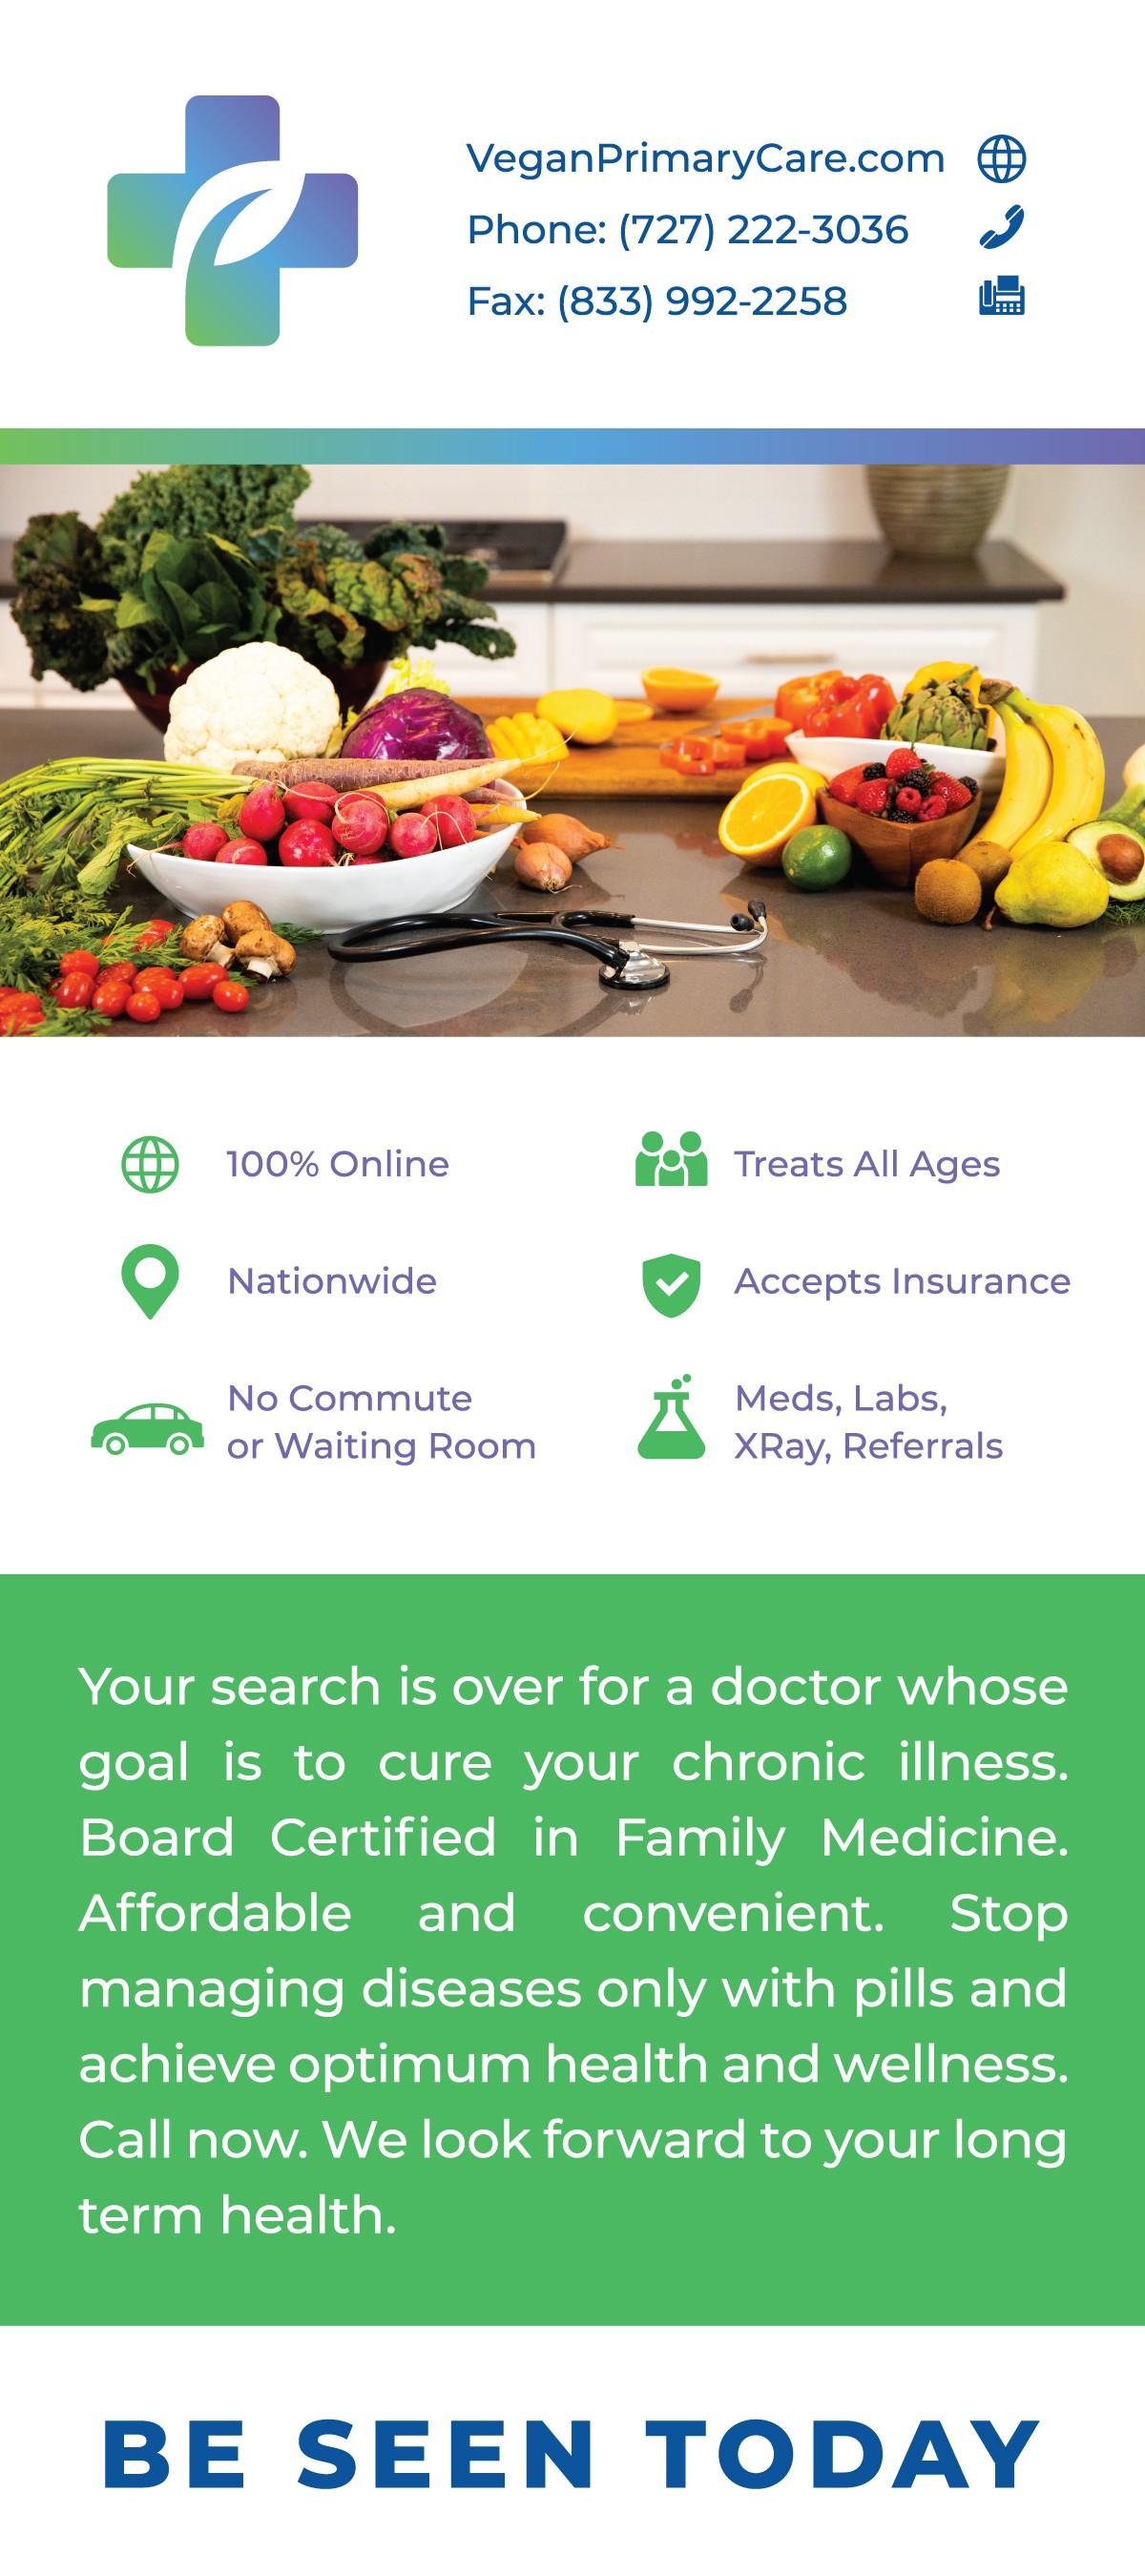 VeganPrimaryCare: Update Name of Dr. Office, Tele-medicine, Solo Vegan Doctor